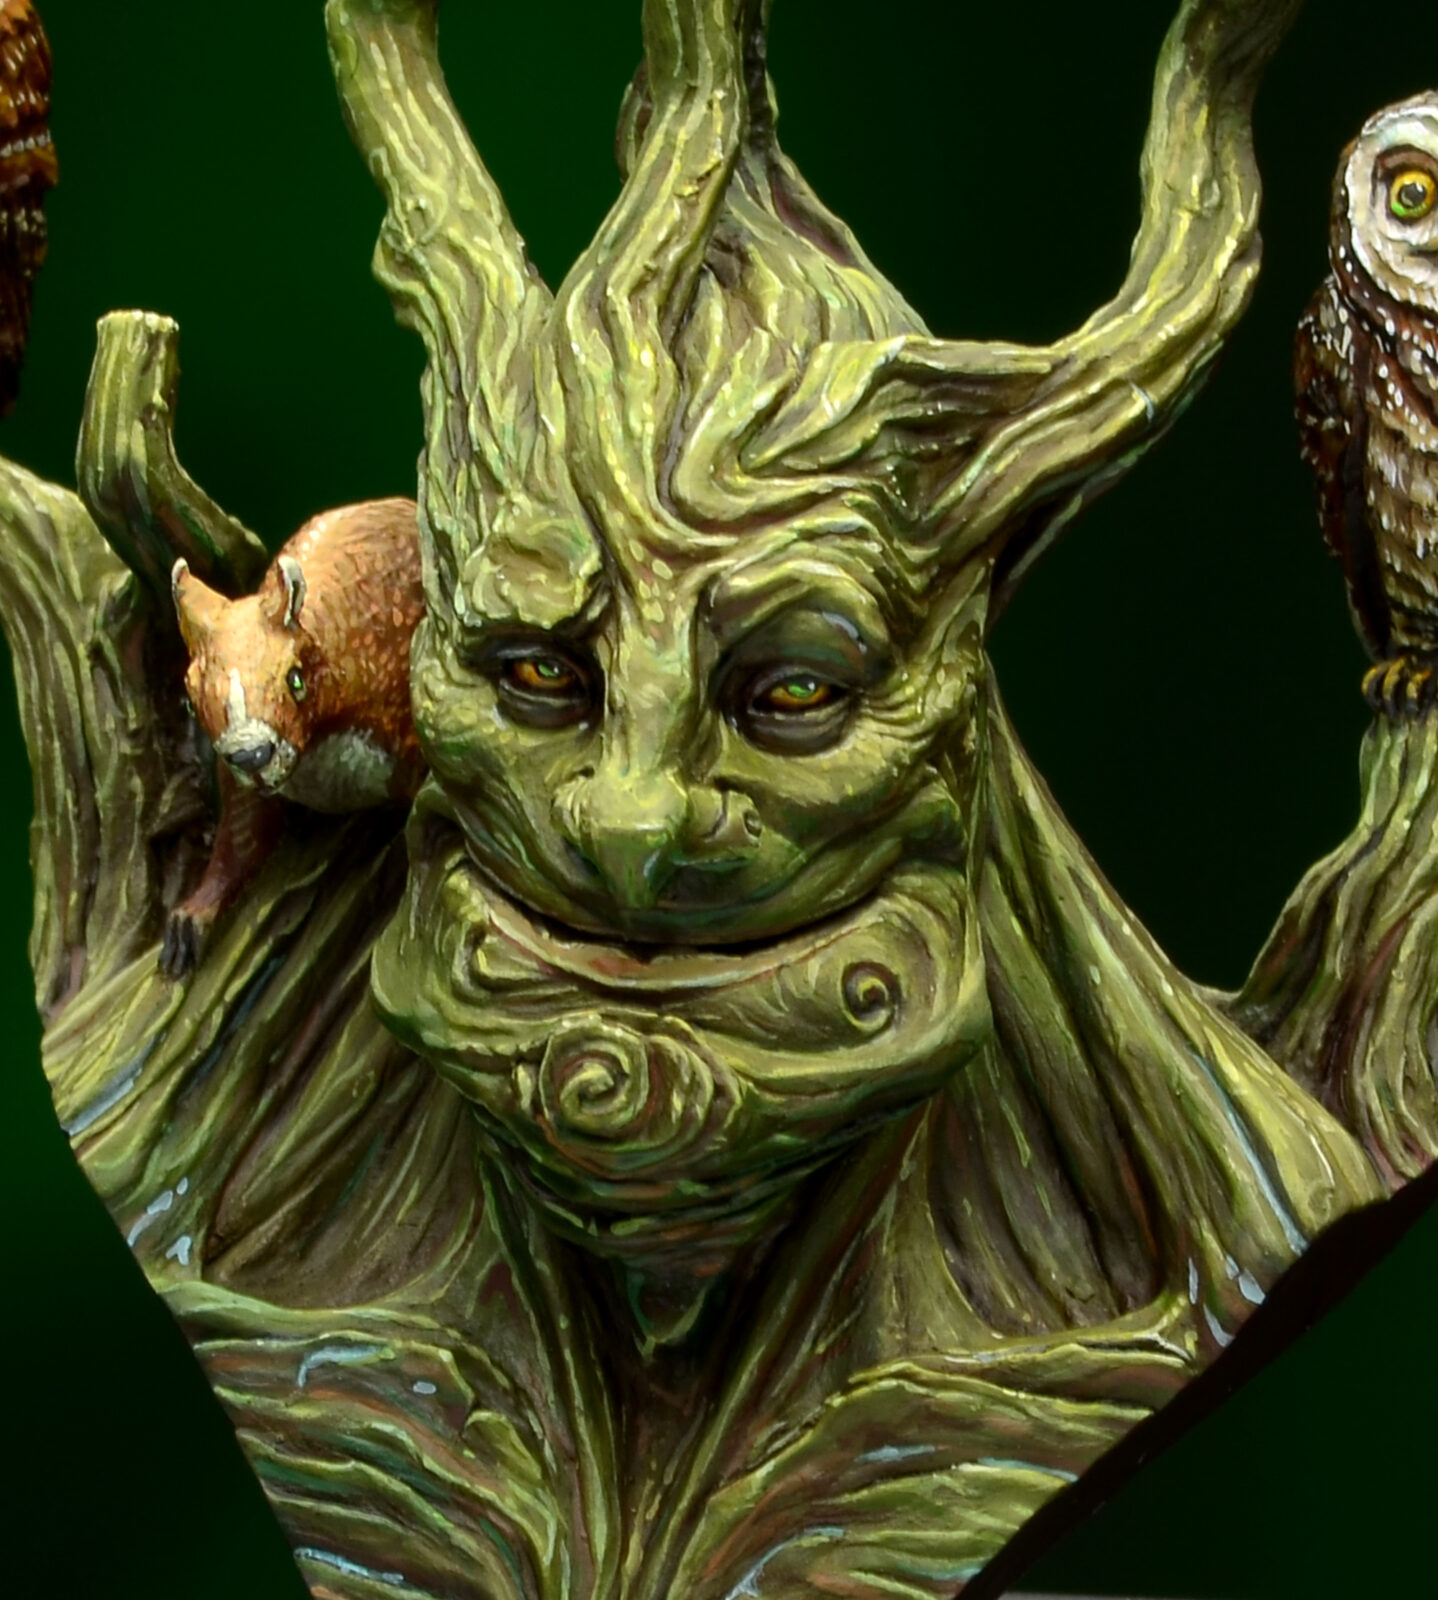 Treeman46